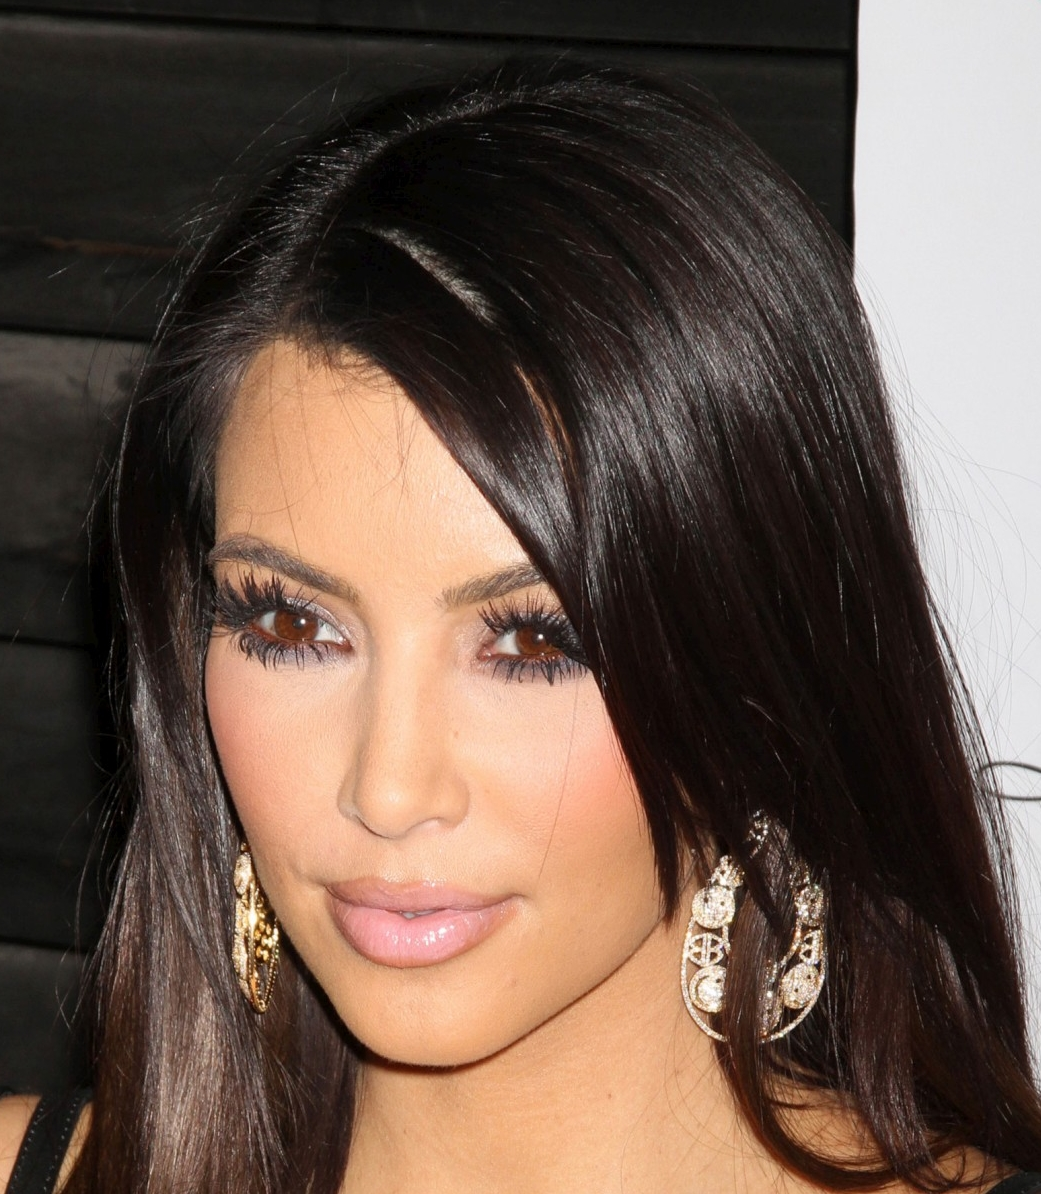 Kim-Kardashian-with-and-without makeup